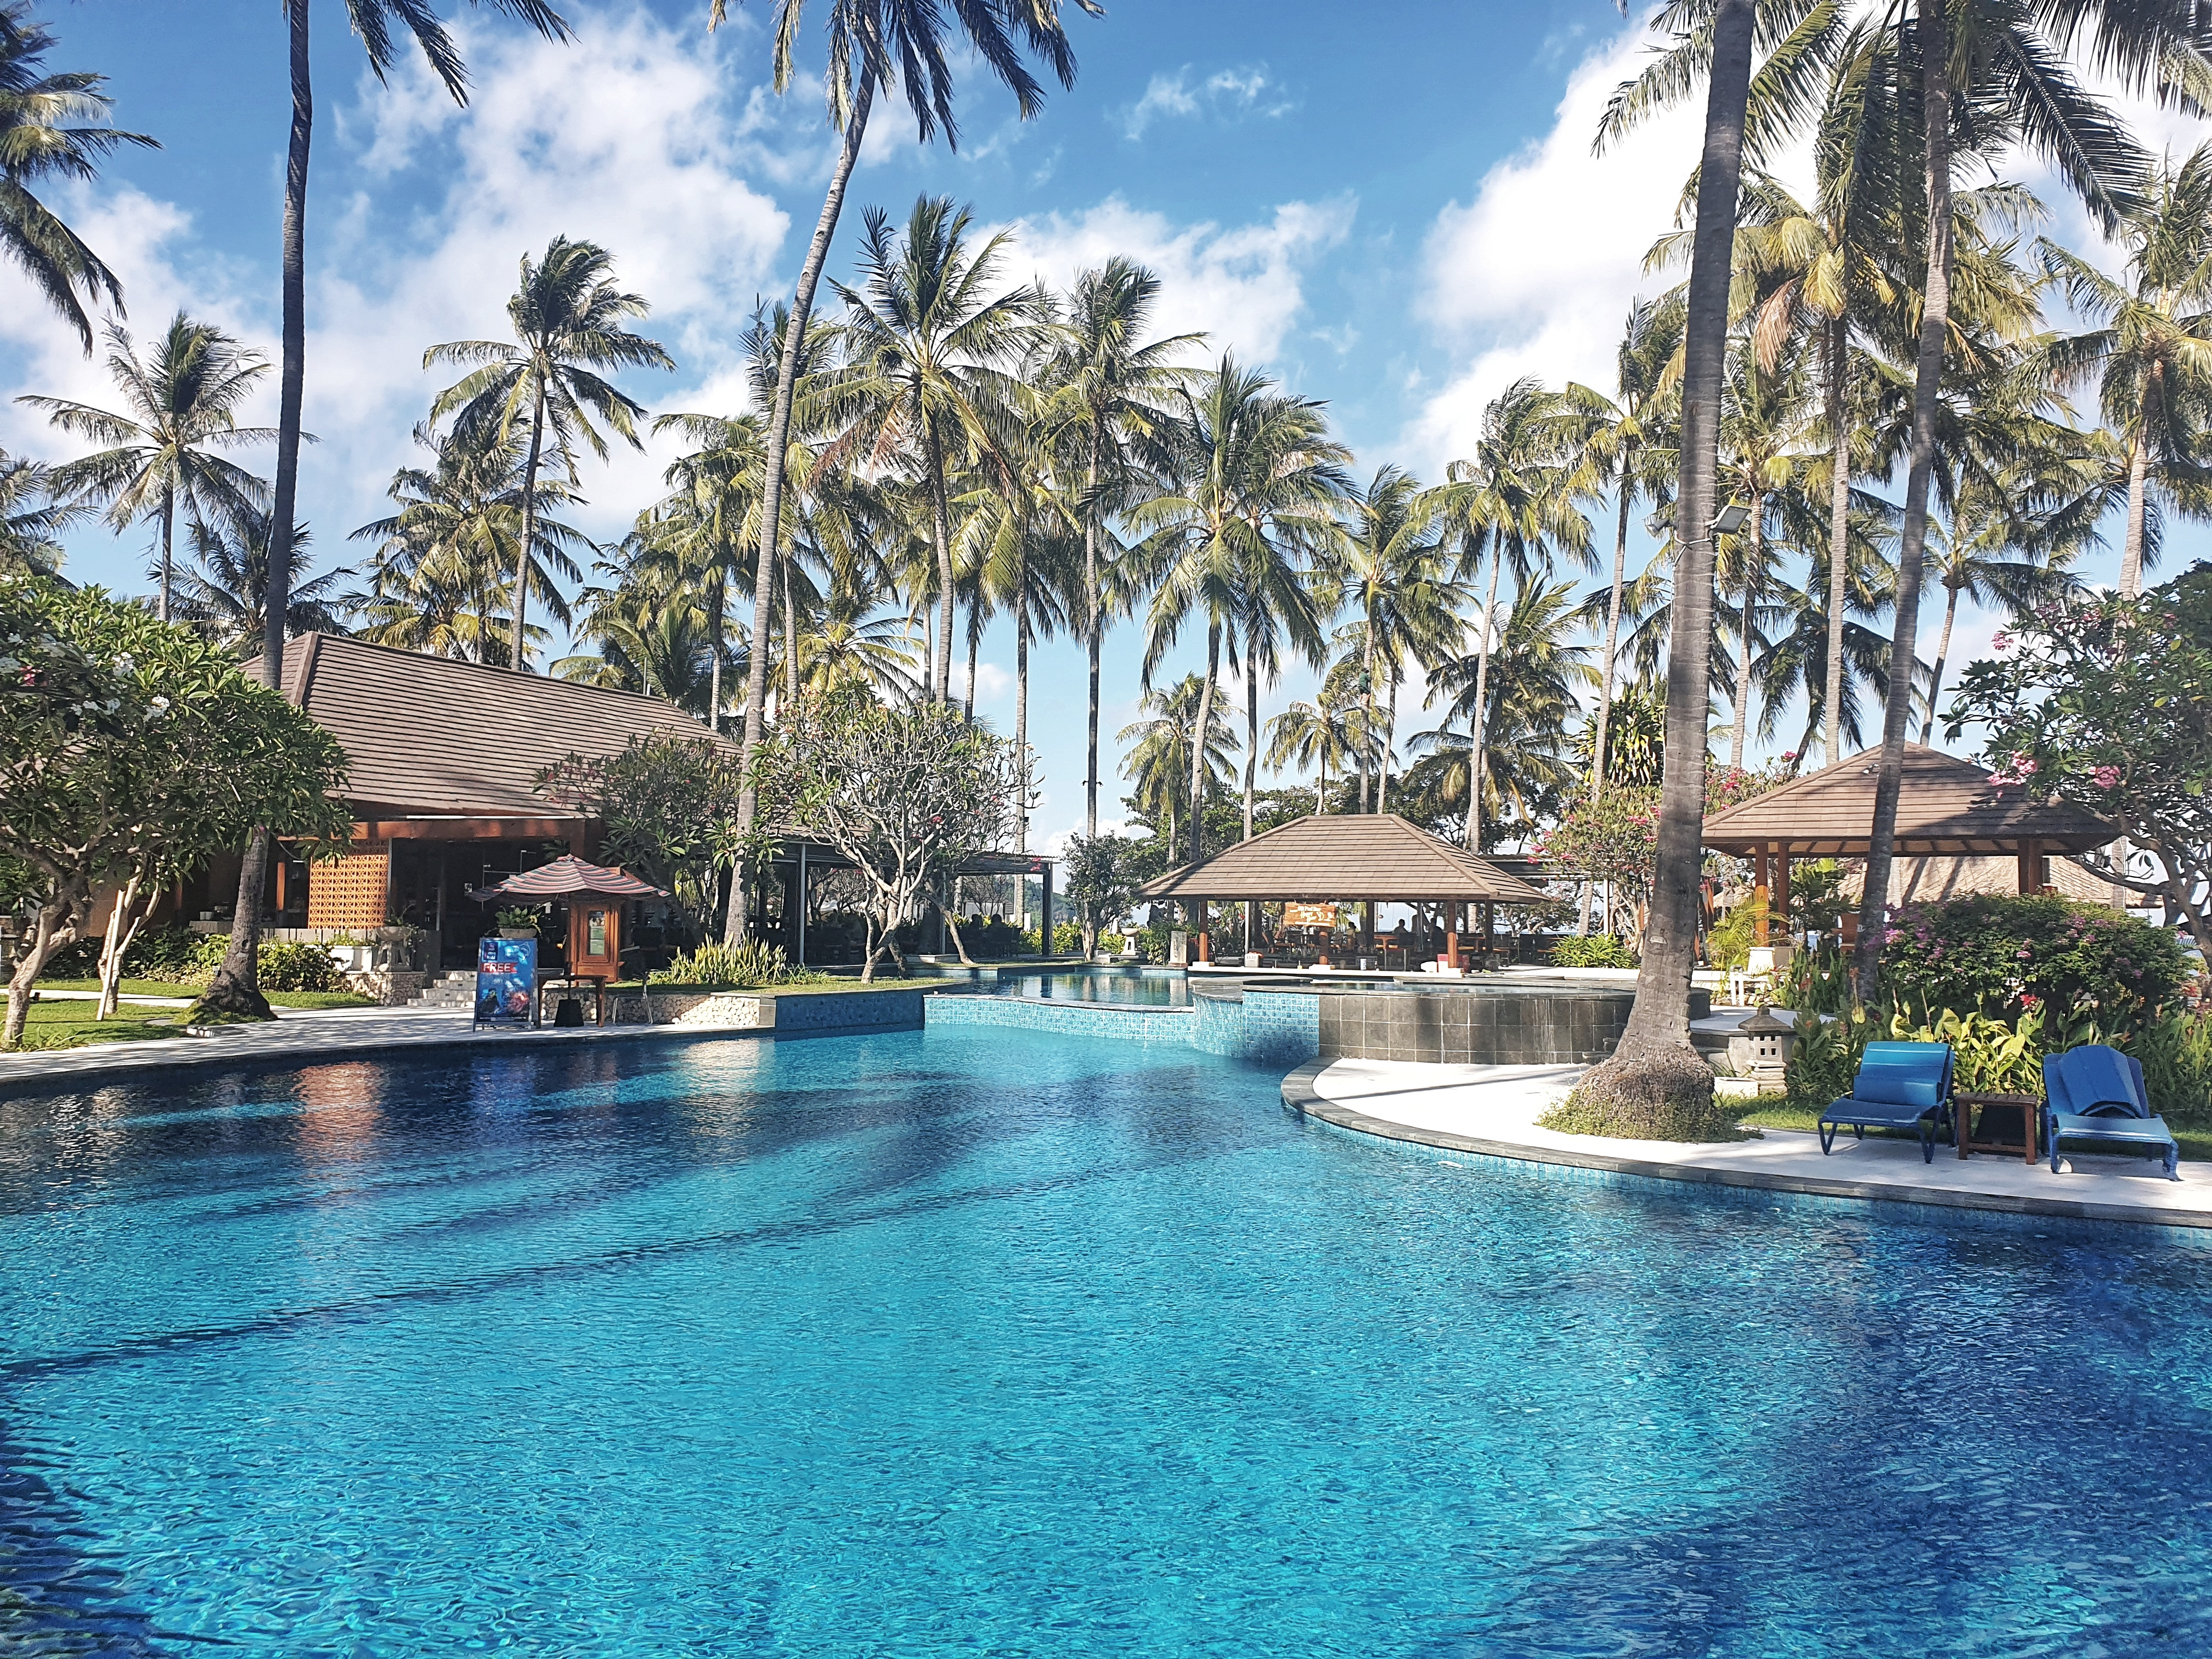 Holiday Resort Lombok, Lombok, Bali, Indonesia